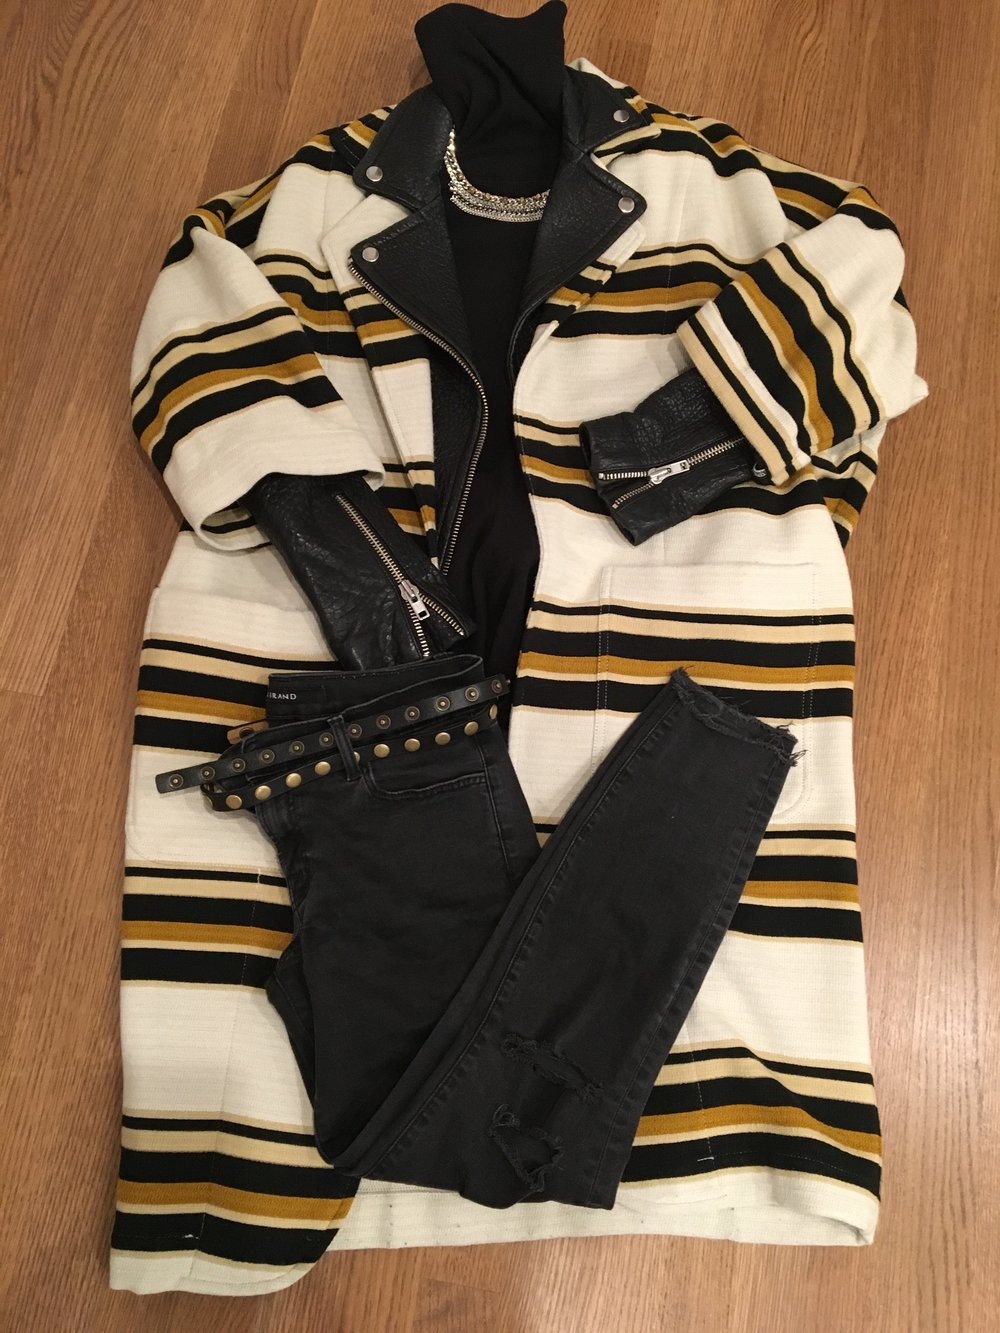 Coat/Jacket/Turtleneck/Jeans